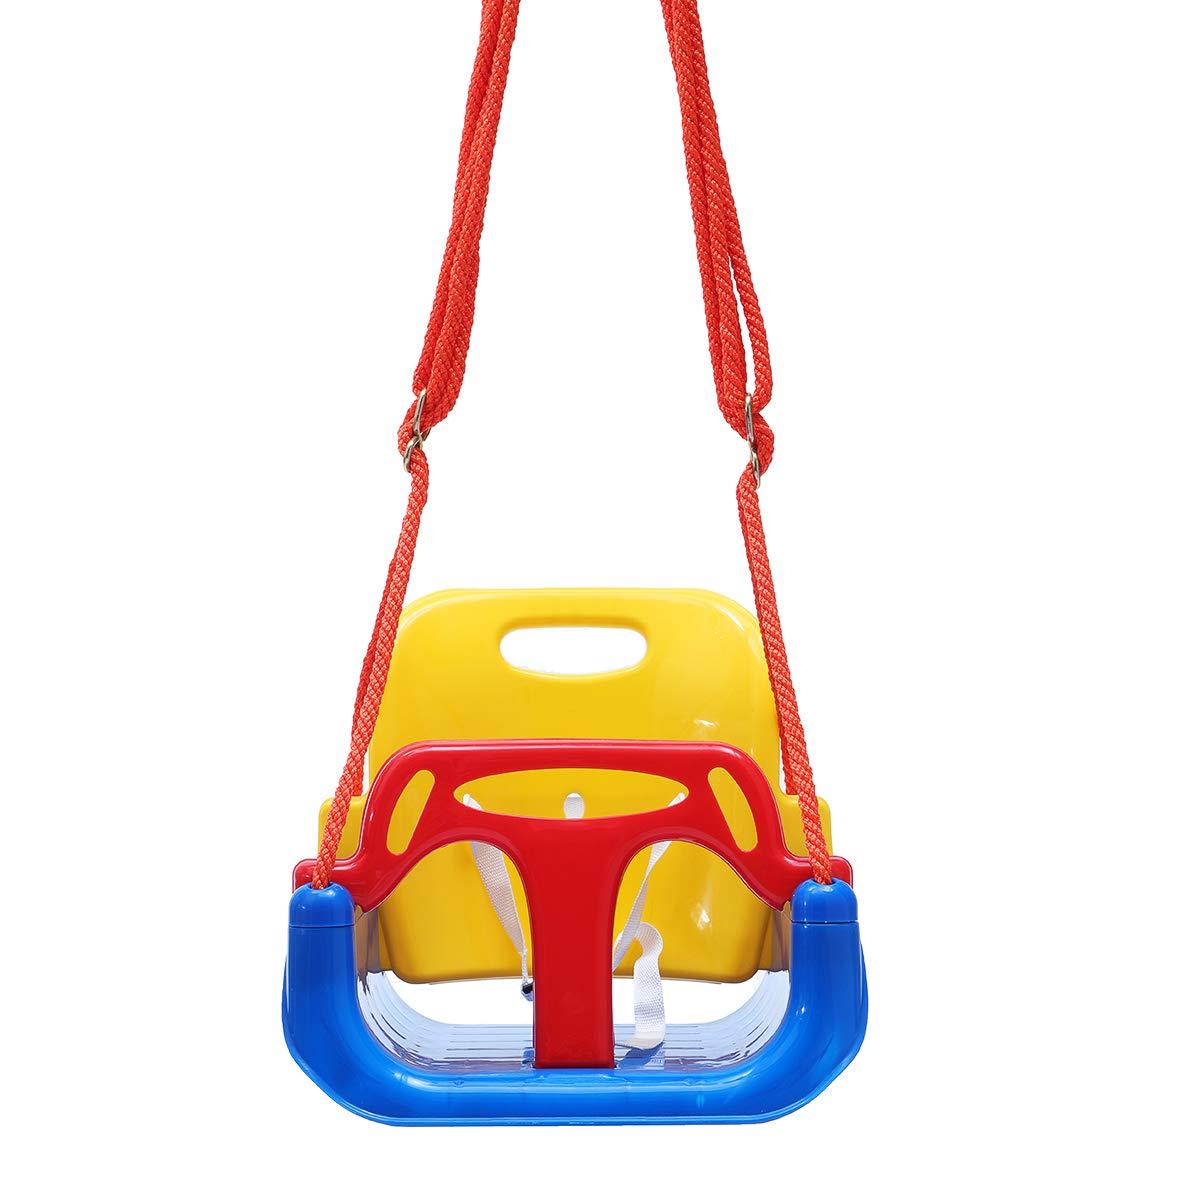 Beho 3の1人の子供の振動座席調節可能なハンモックの椅子のキャンプの赤ん坊のロッキングチェアの屋外のキャンプ B07HH8LT79